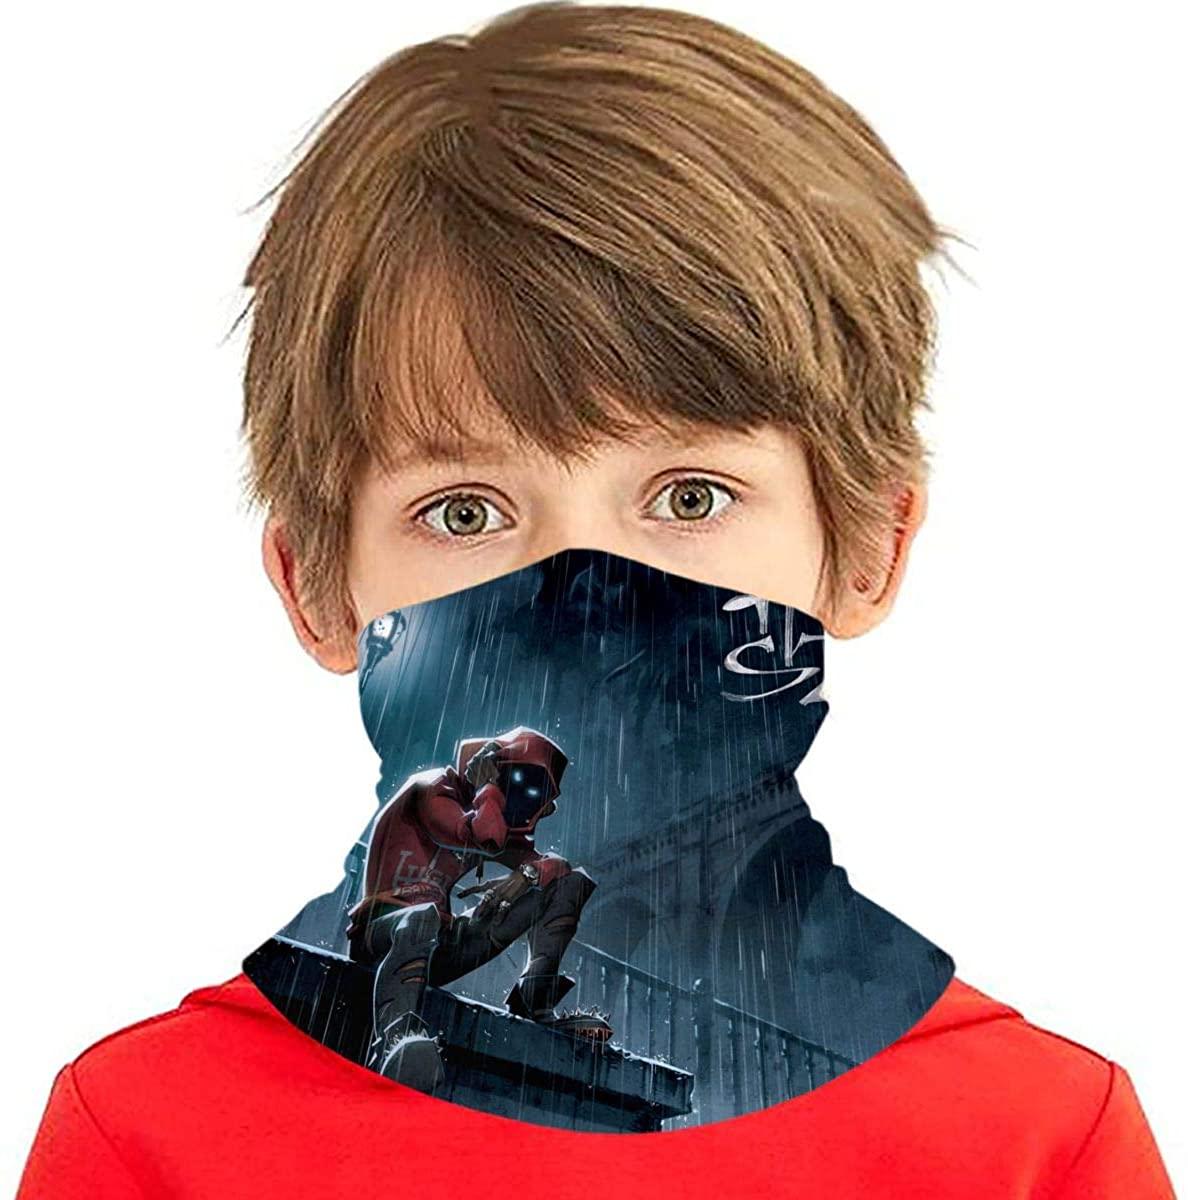 Hoodie Szn Kids Bandana Ear Loops Neck Gaiter Scarf Dust Uv Protection For Boys Girls